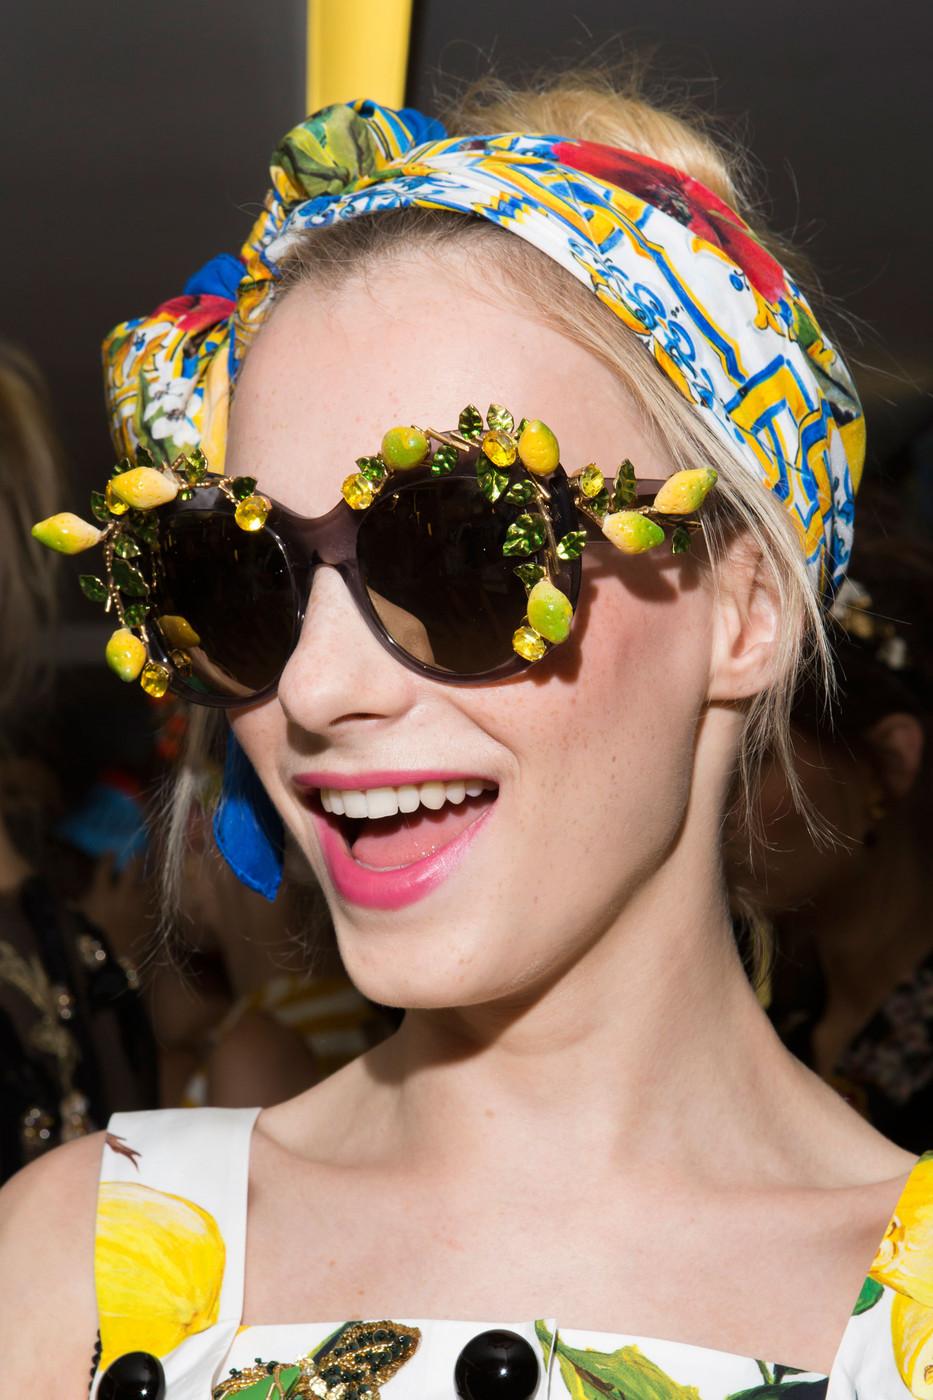 Dolce+Gabbana+Spring+2016+Backstage+Wot-ERqjZ8Ox.jpg